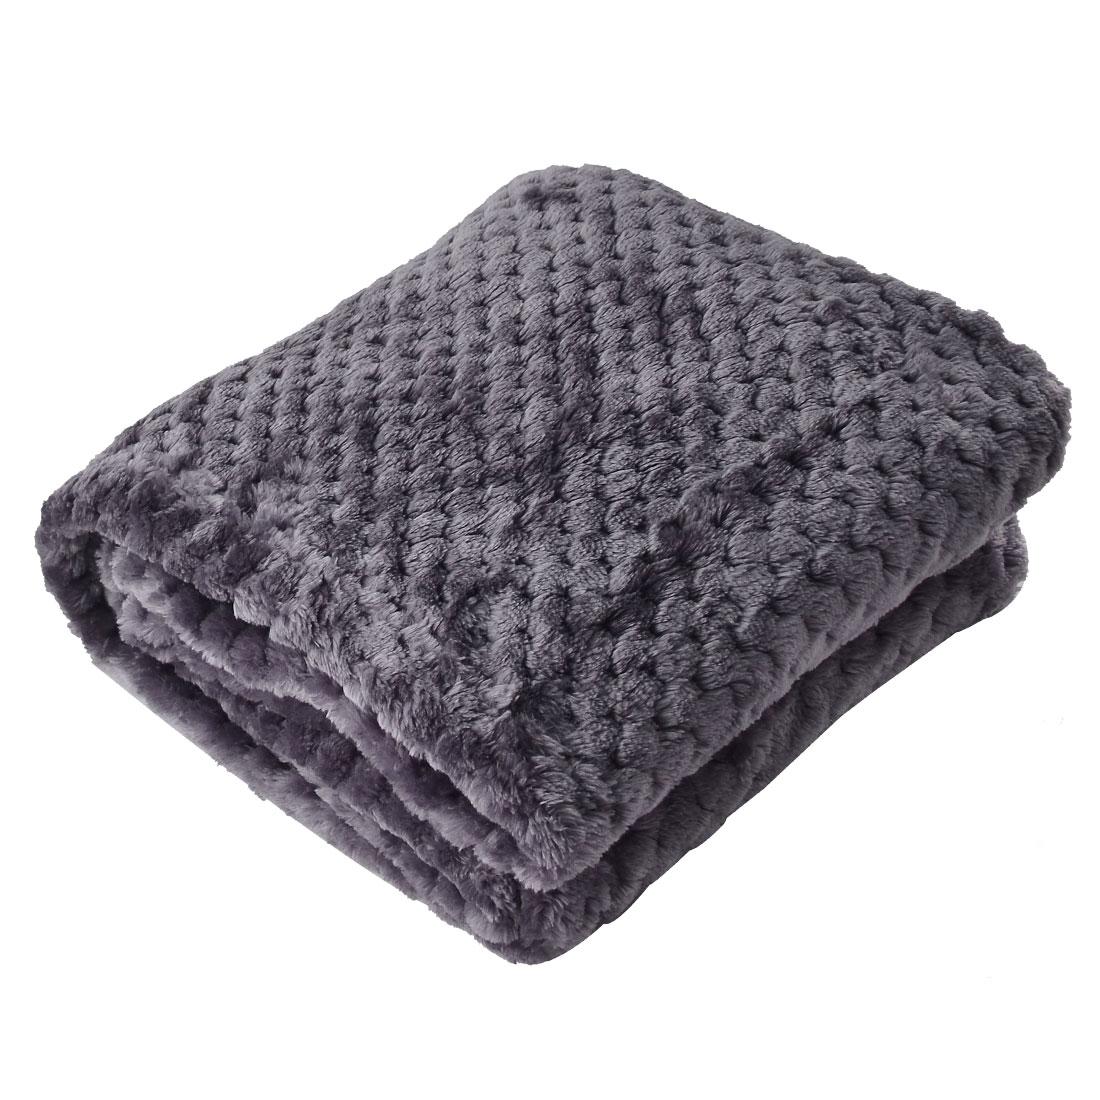 Home Bedroom Travel Warm Soft Throw Mesh Blanket Bed Rug Plush Fleece Lavender